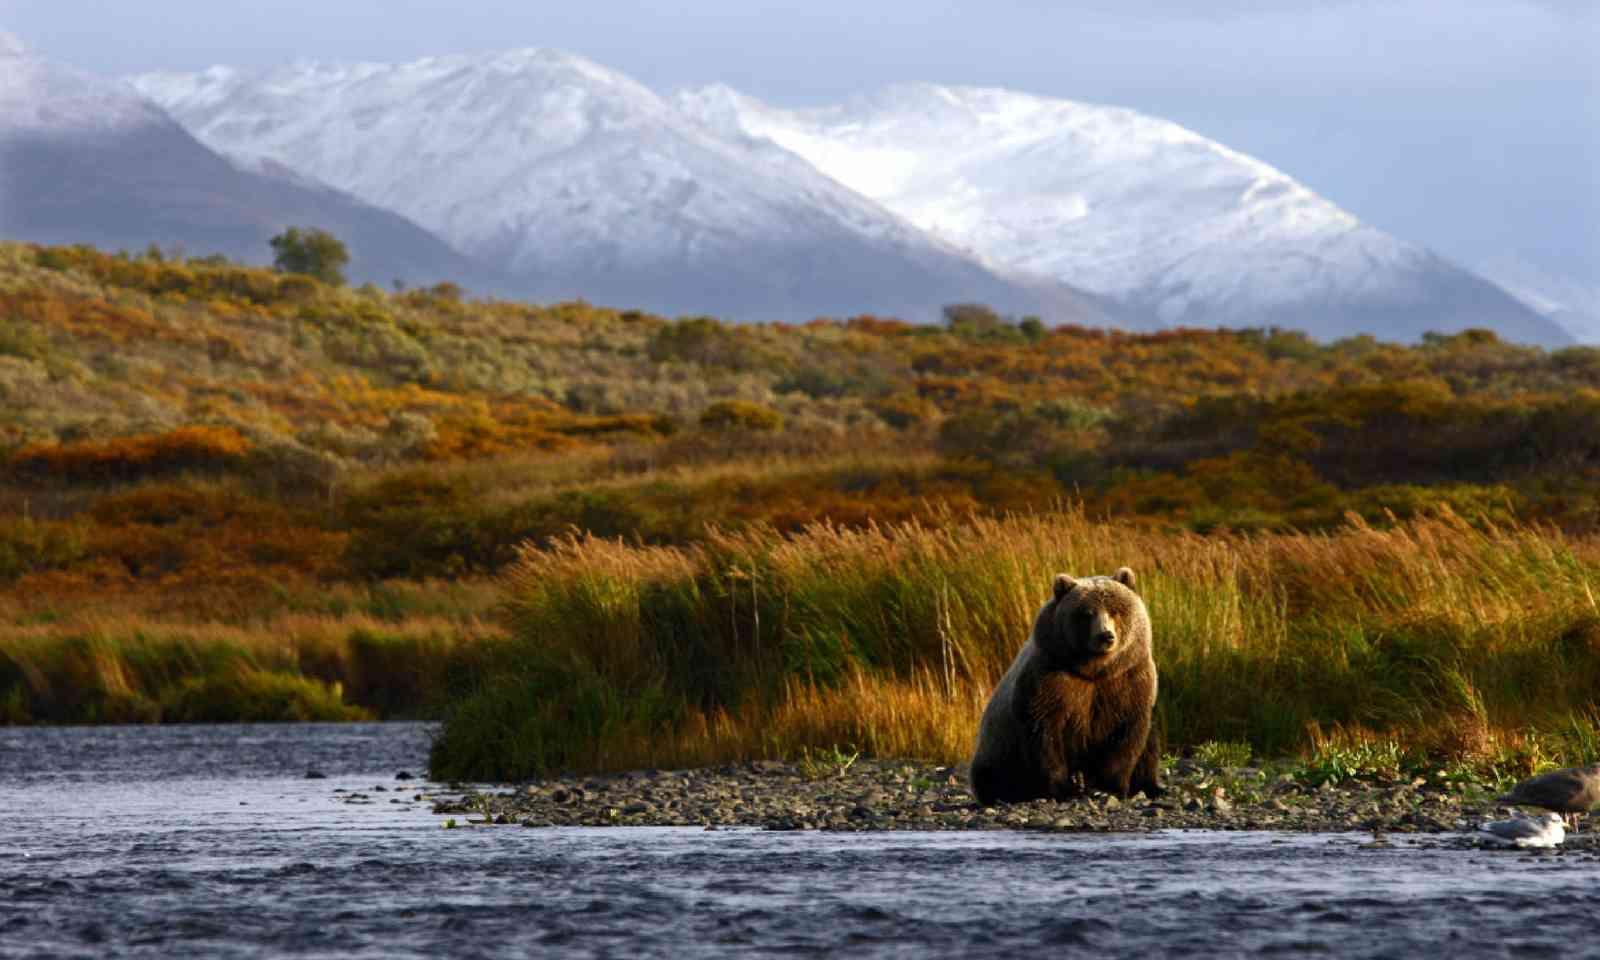 Brown bear, Kodiak Island (Shutterstock)